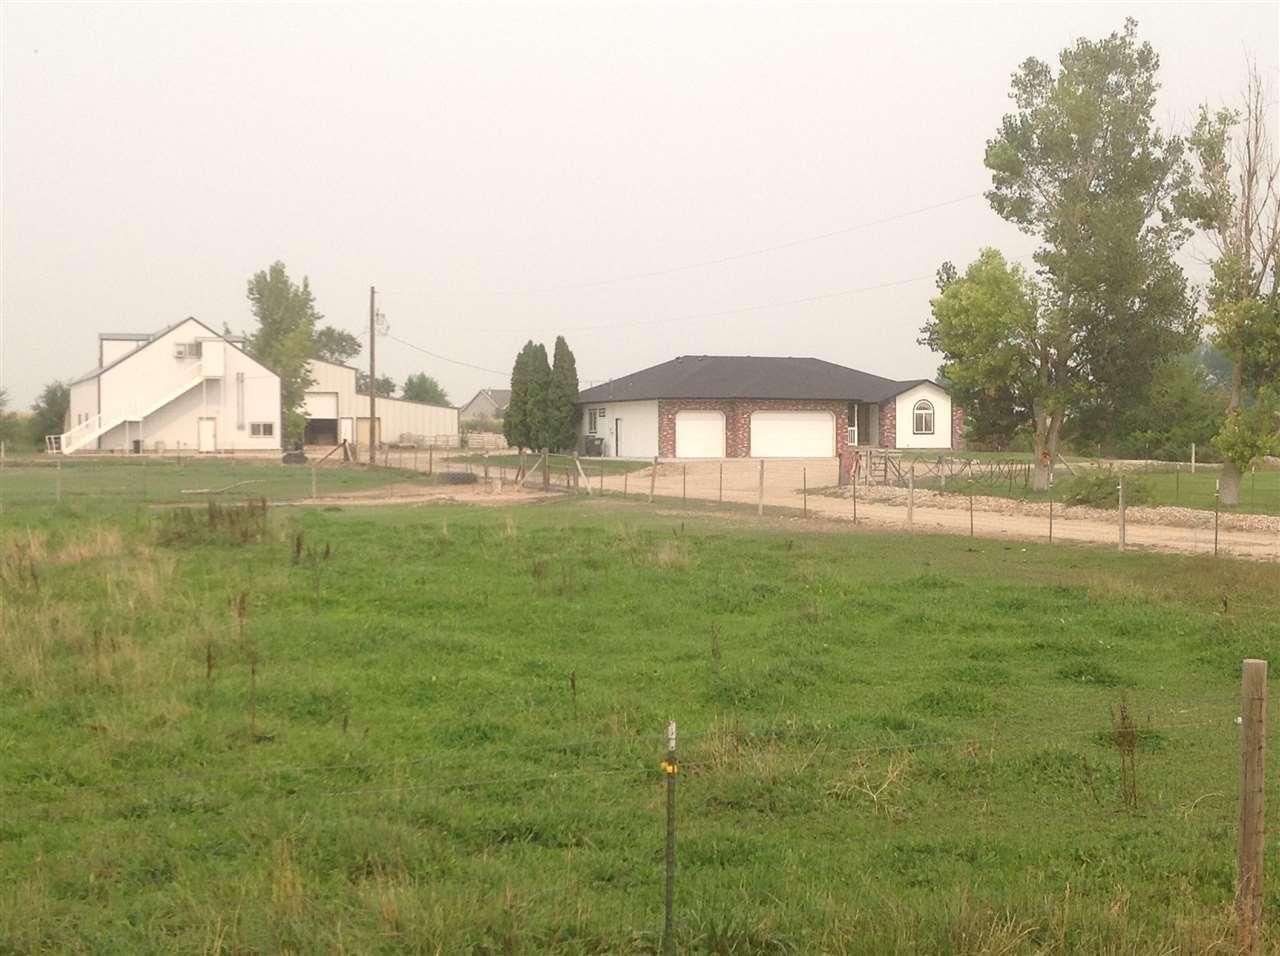 Single Family Home for Sale at 8624 Melmont Road Melba, Idaho 83641